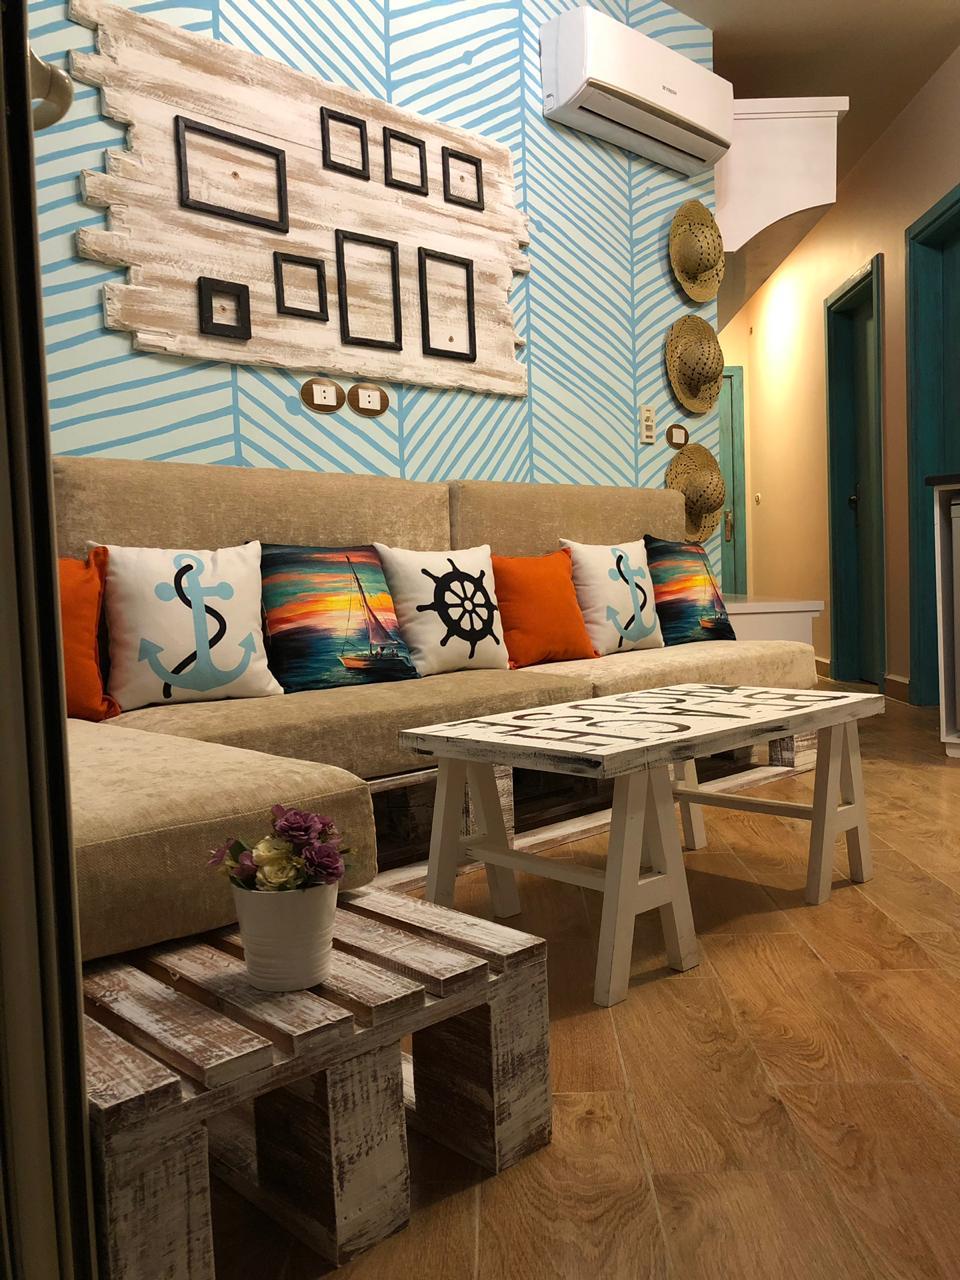 beach house@porto el sokhna 32m2